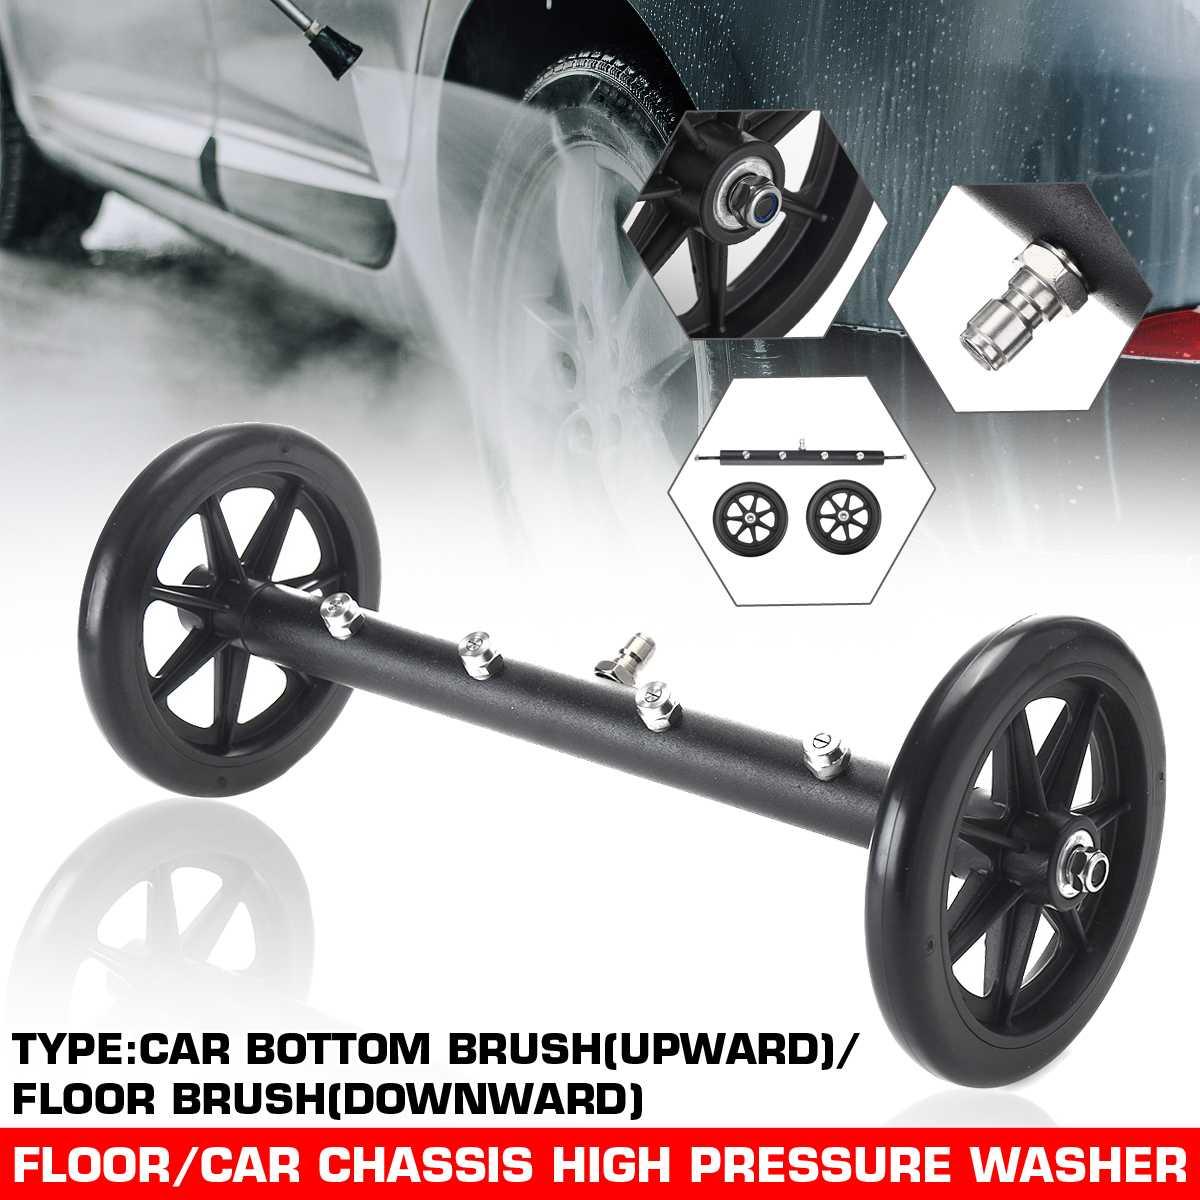 maquina de lavar carro de alta pressao sob o corpo chassi cleaner 1 4 polegada macho